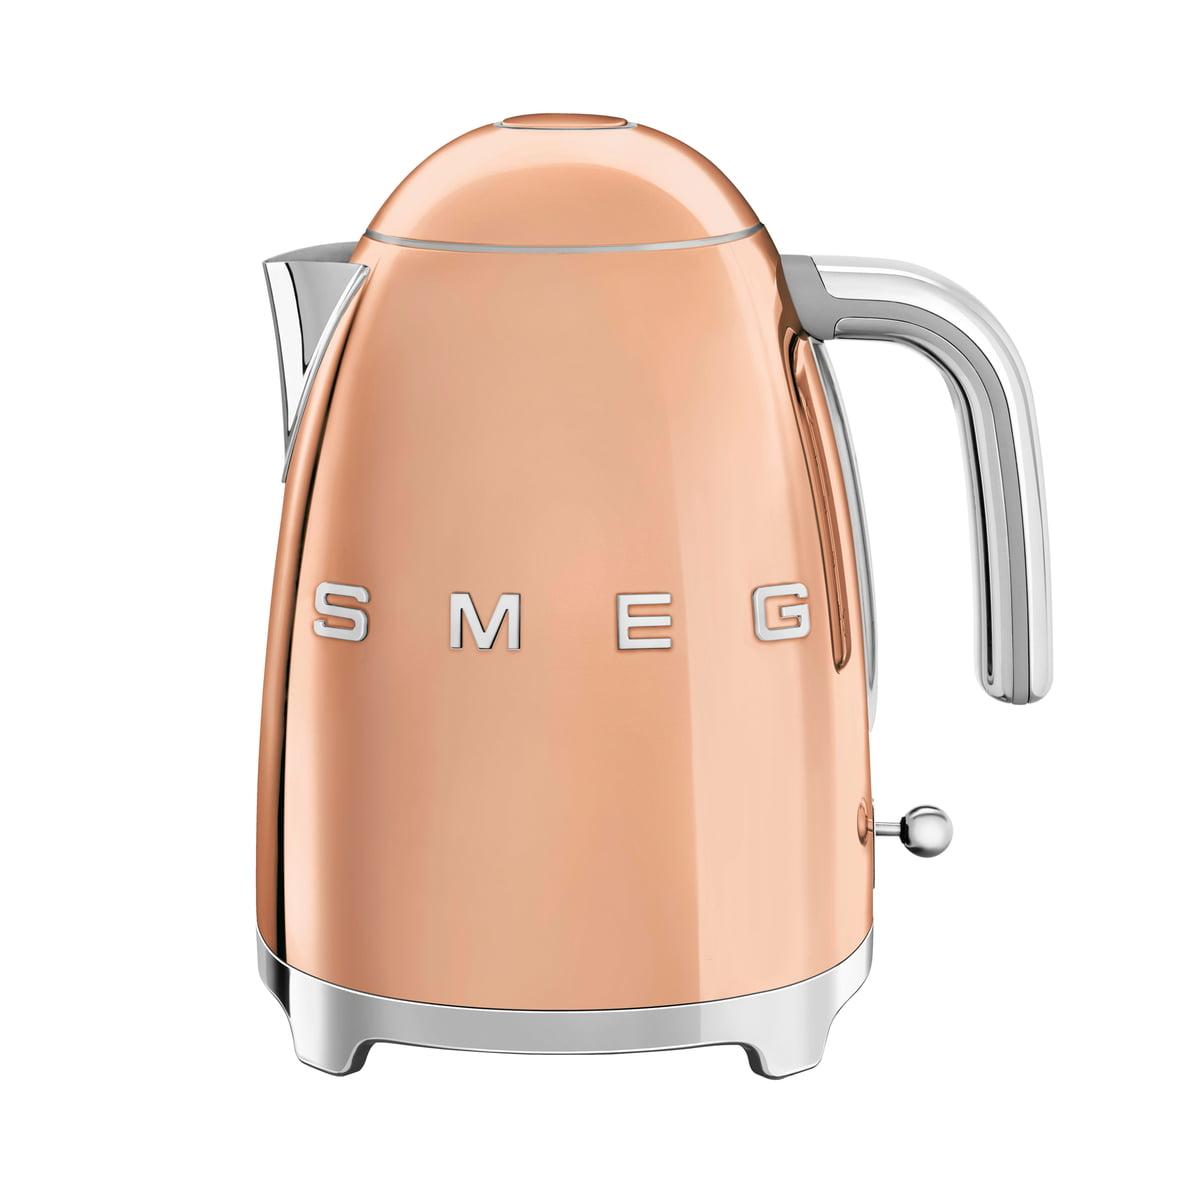 Smeg - Wasserkocher 1,7 l (KLF03), rosegold | Küche und Esszimmer > Küchengeräte > Wasserkocher | Roségold | Edelstahl -  lackiert | Smeg